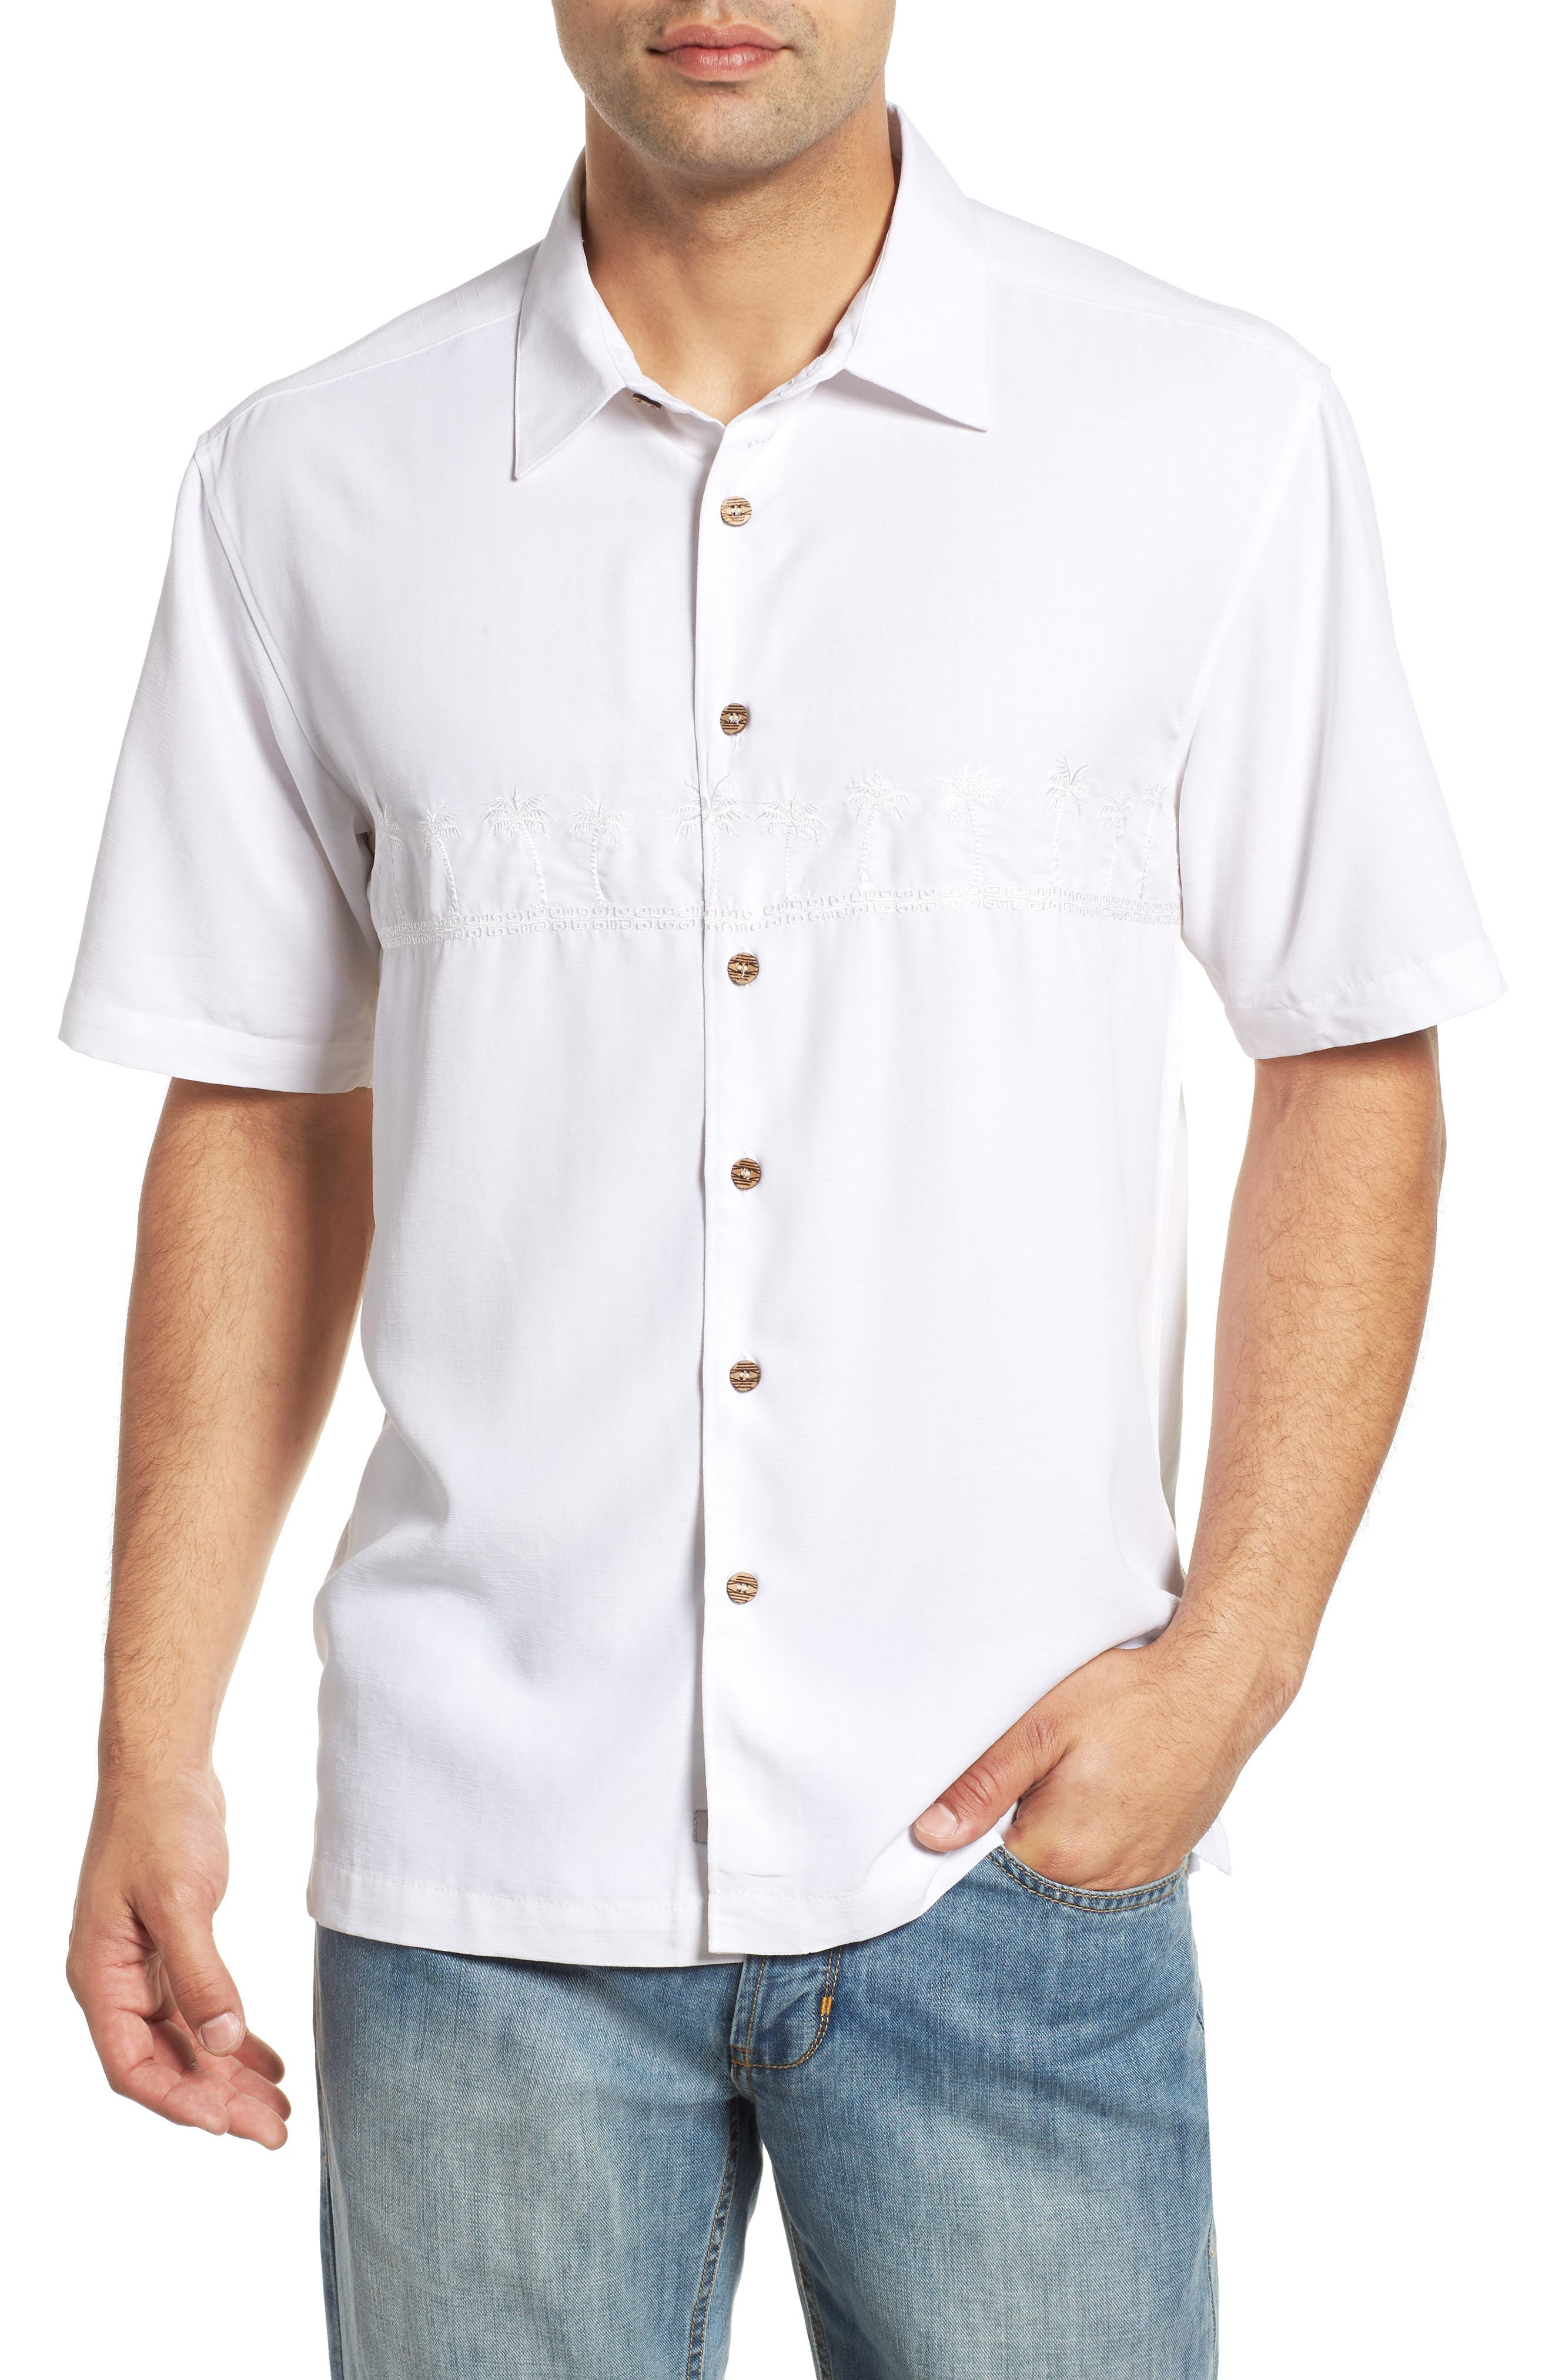 QUIKSILVER WATERMAN COLLECTION Tahiti Palms Regular Fit Sport Shirt, Main, color, WHITE